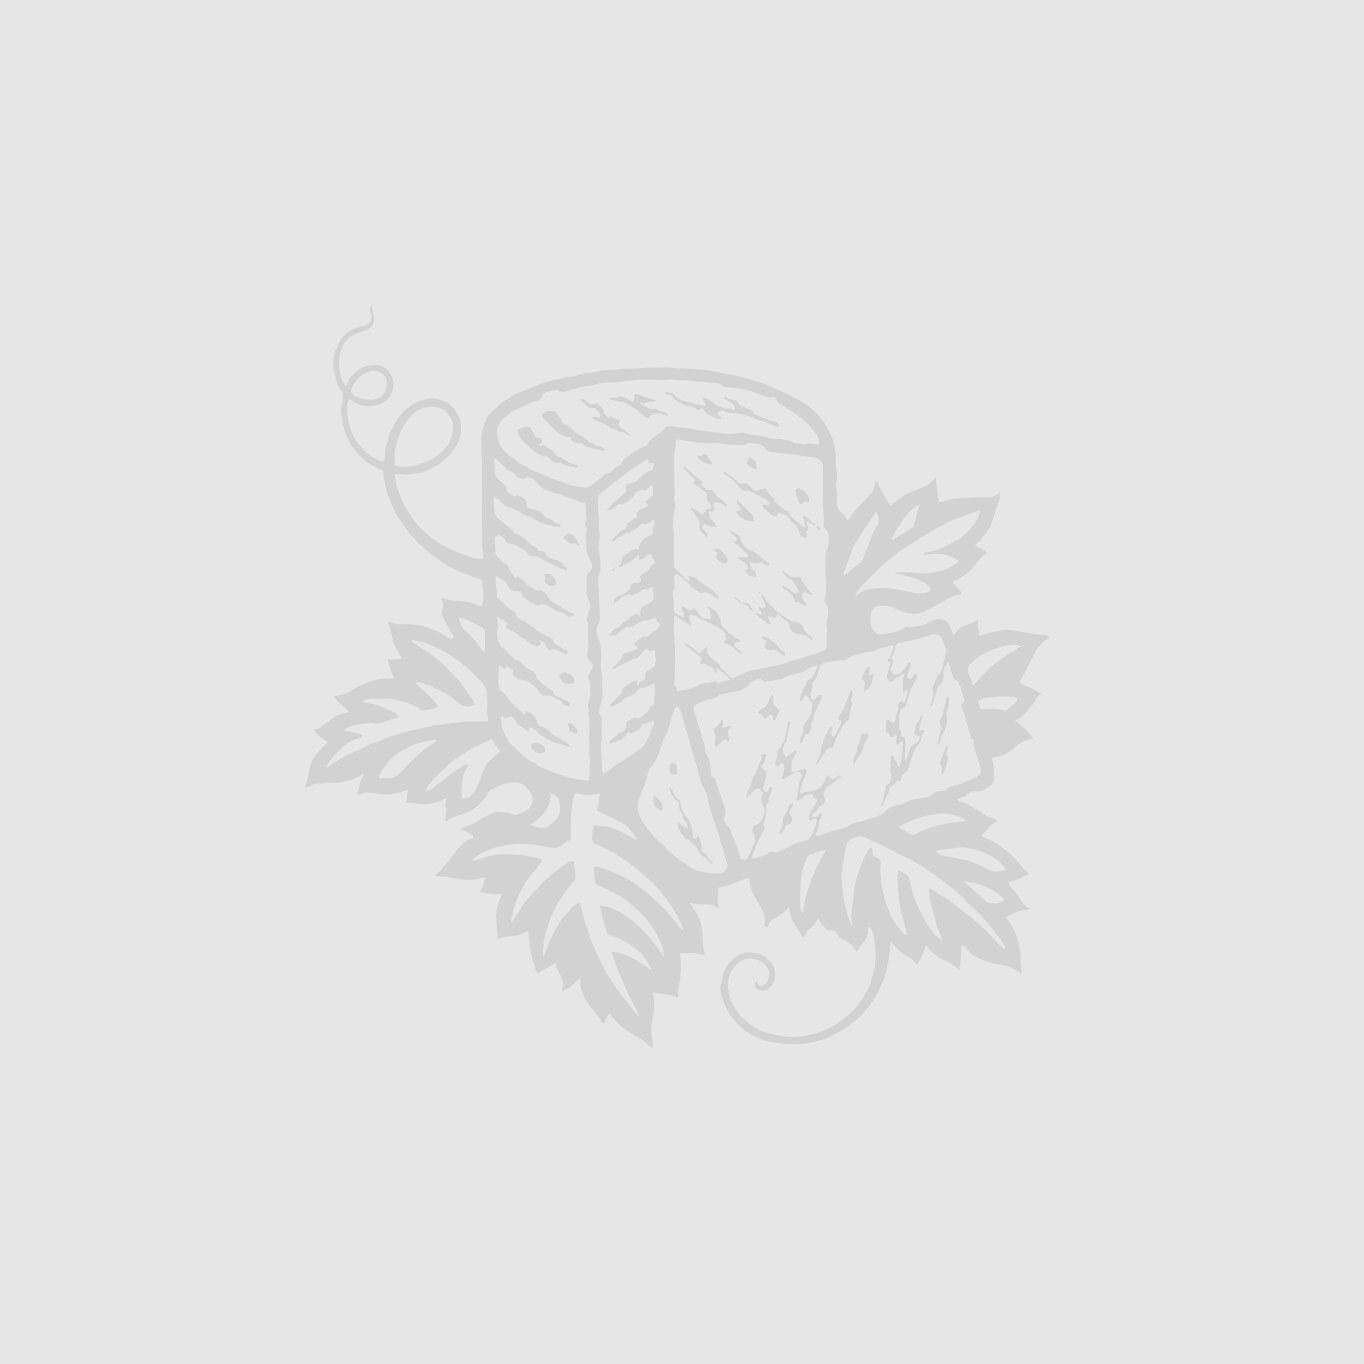 Gorgonzola Al Cucchiaio 250g